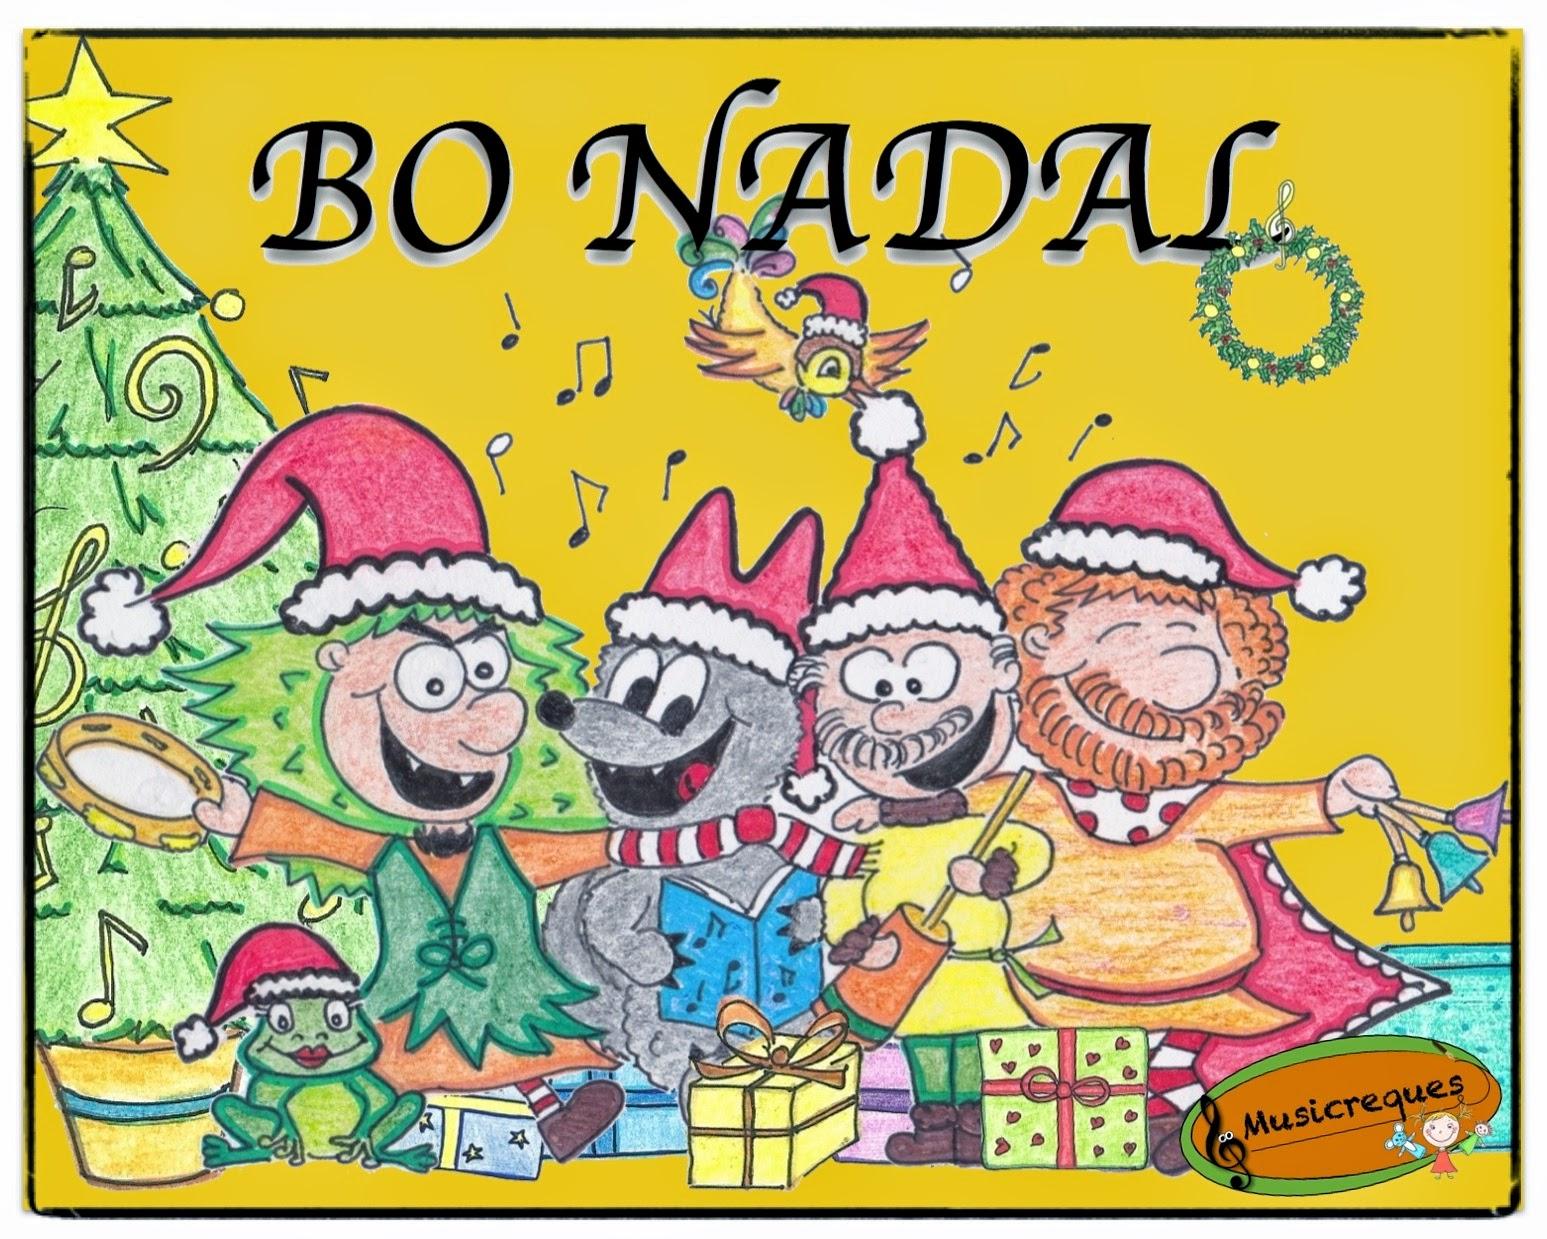 Musicreques deséxavos un Bo Nadal!